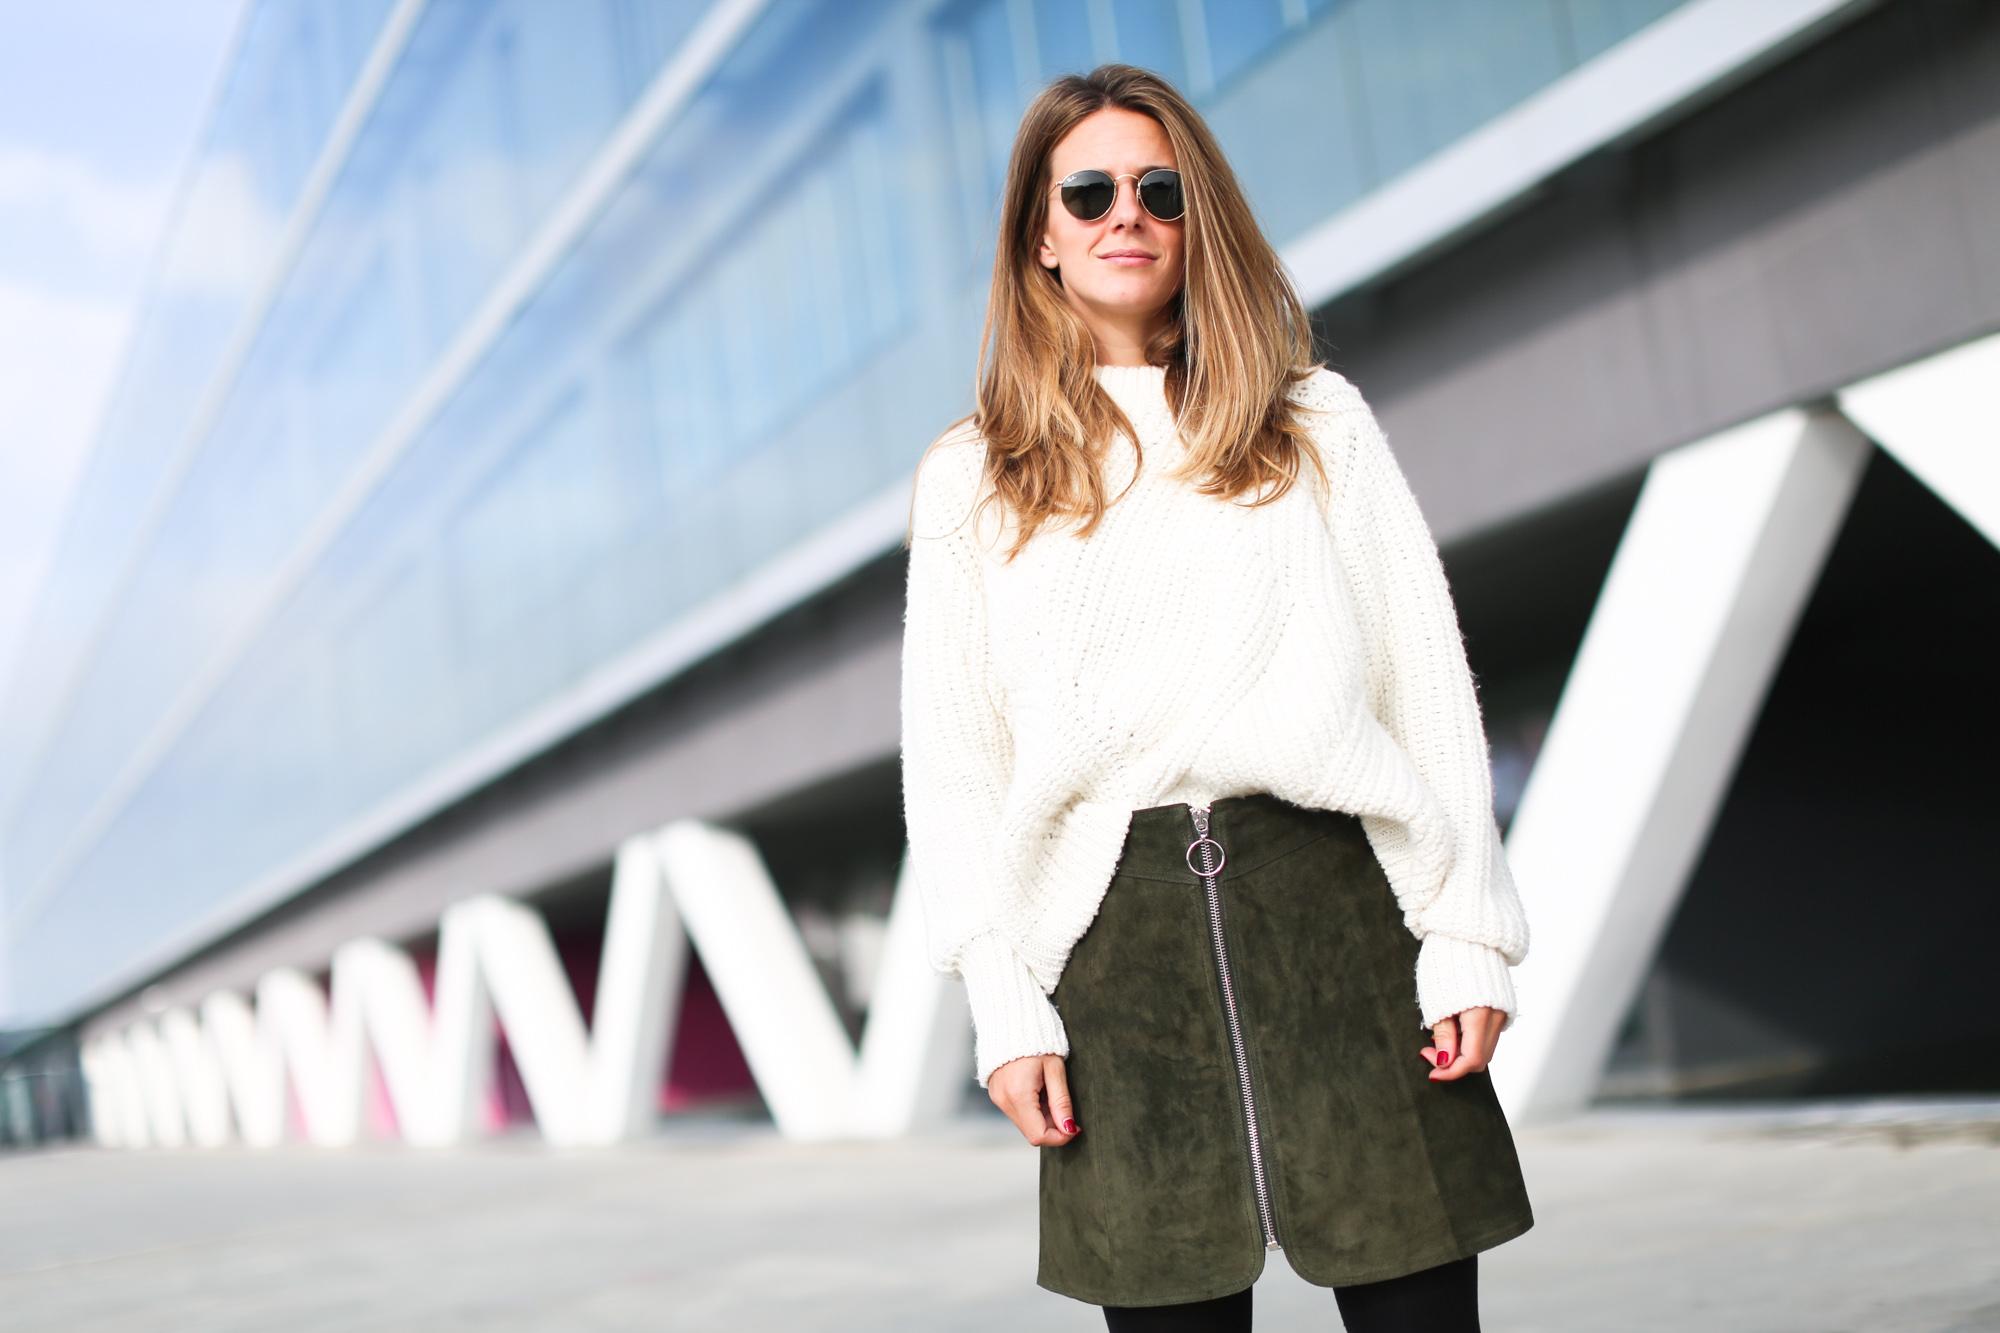 Clochet_streetstyle_fashionblogger_asosfauxfurcoat_minifaldaantezara_botinespieldorados-5